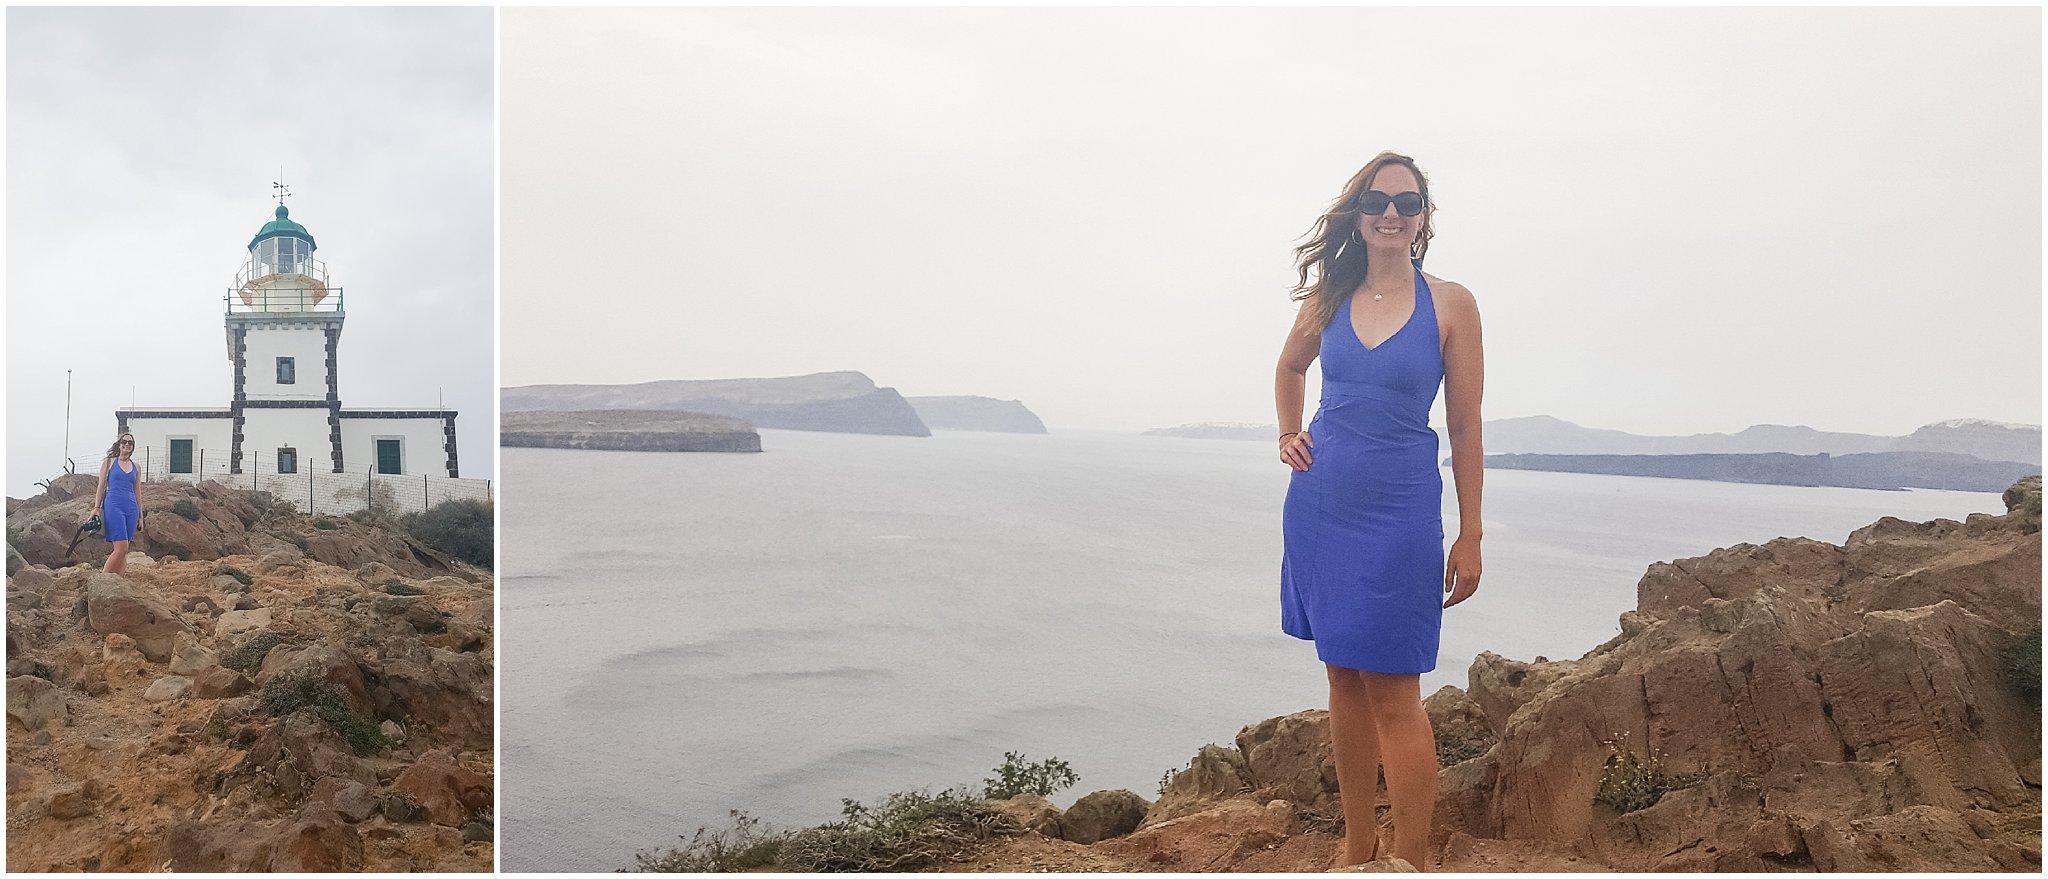 Greece_vacation_0095c.jpg